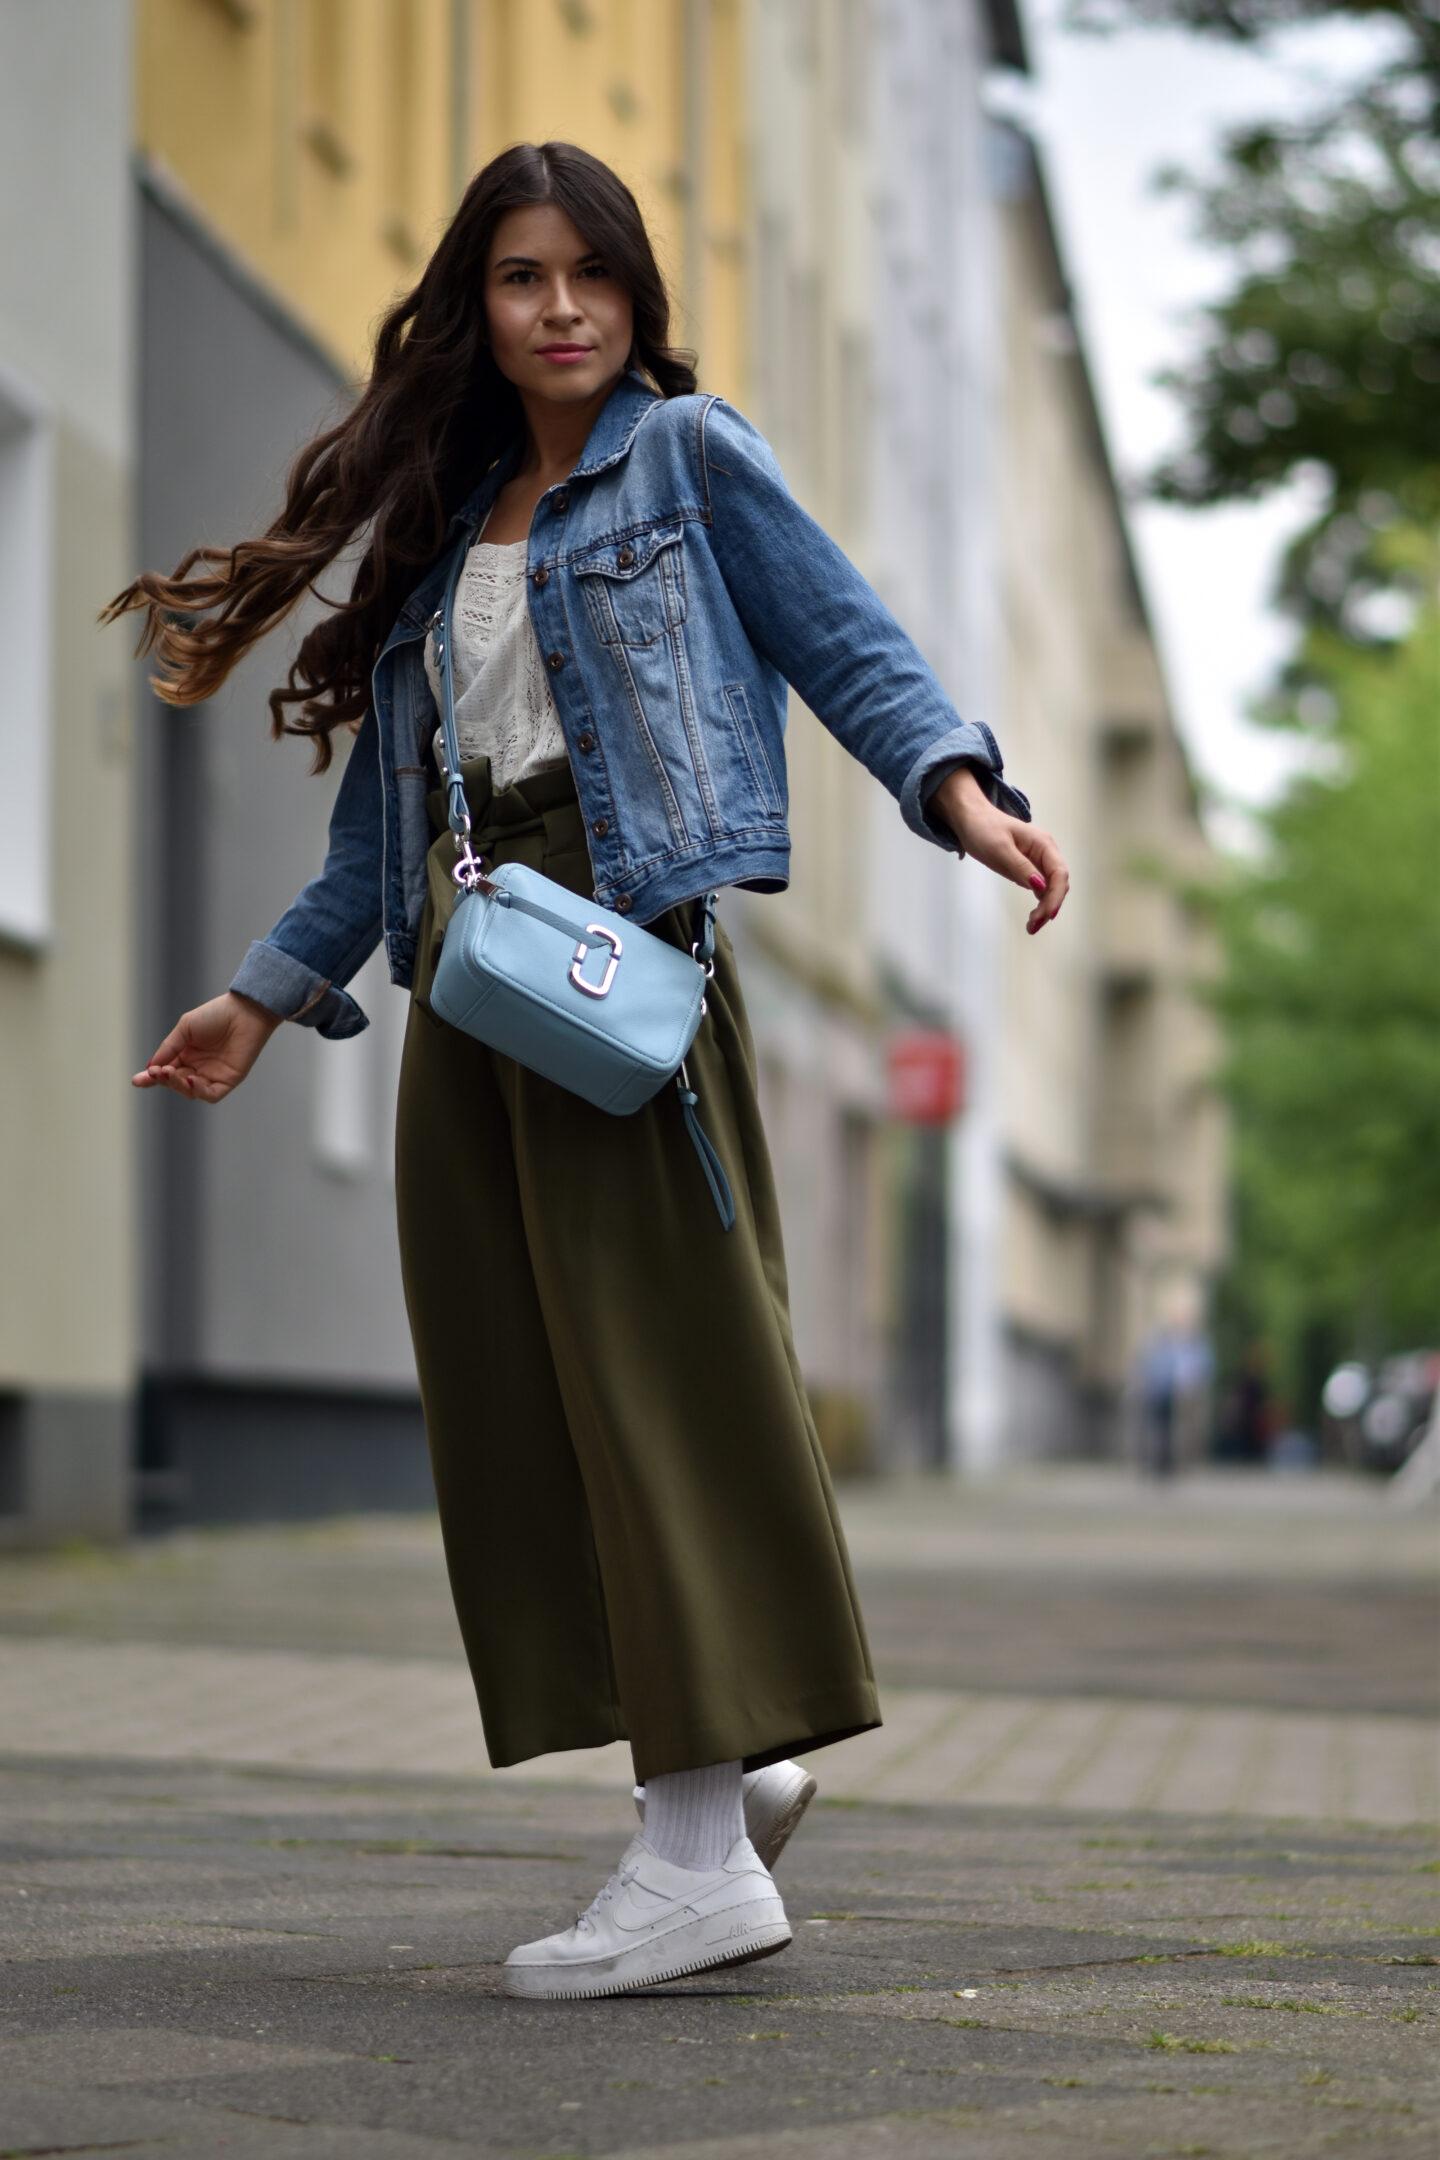 Streetstyle mit Jeansjacke